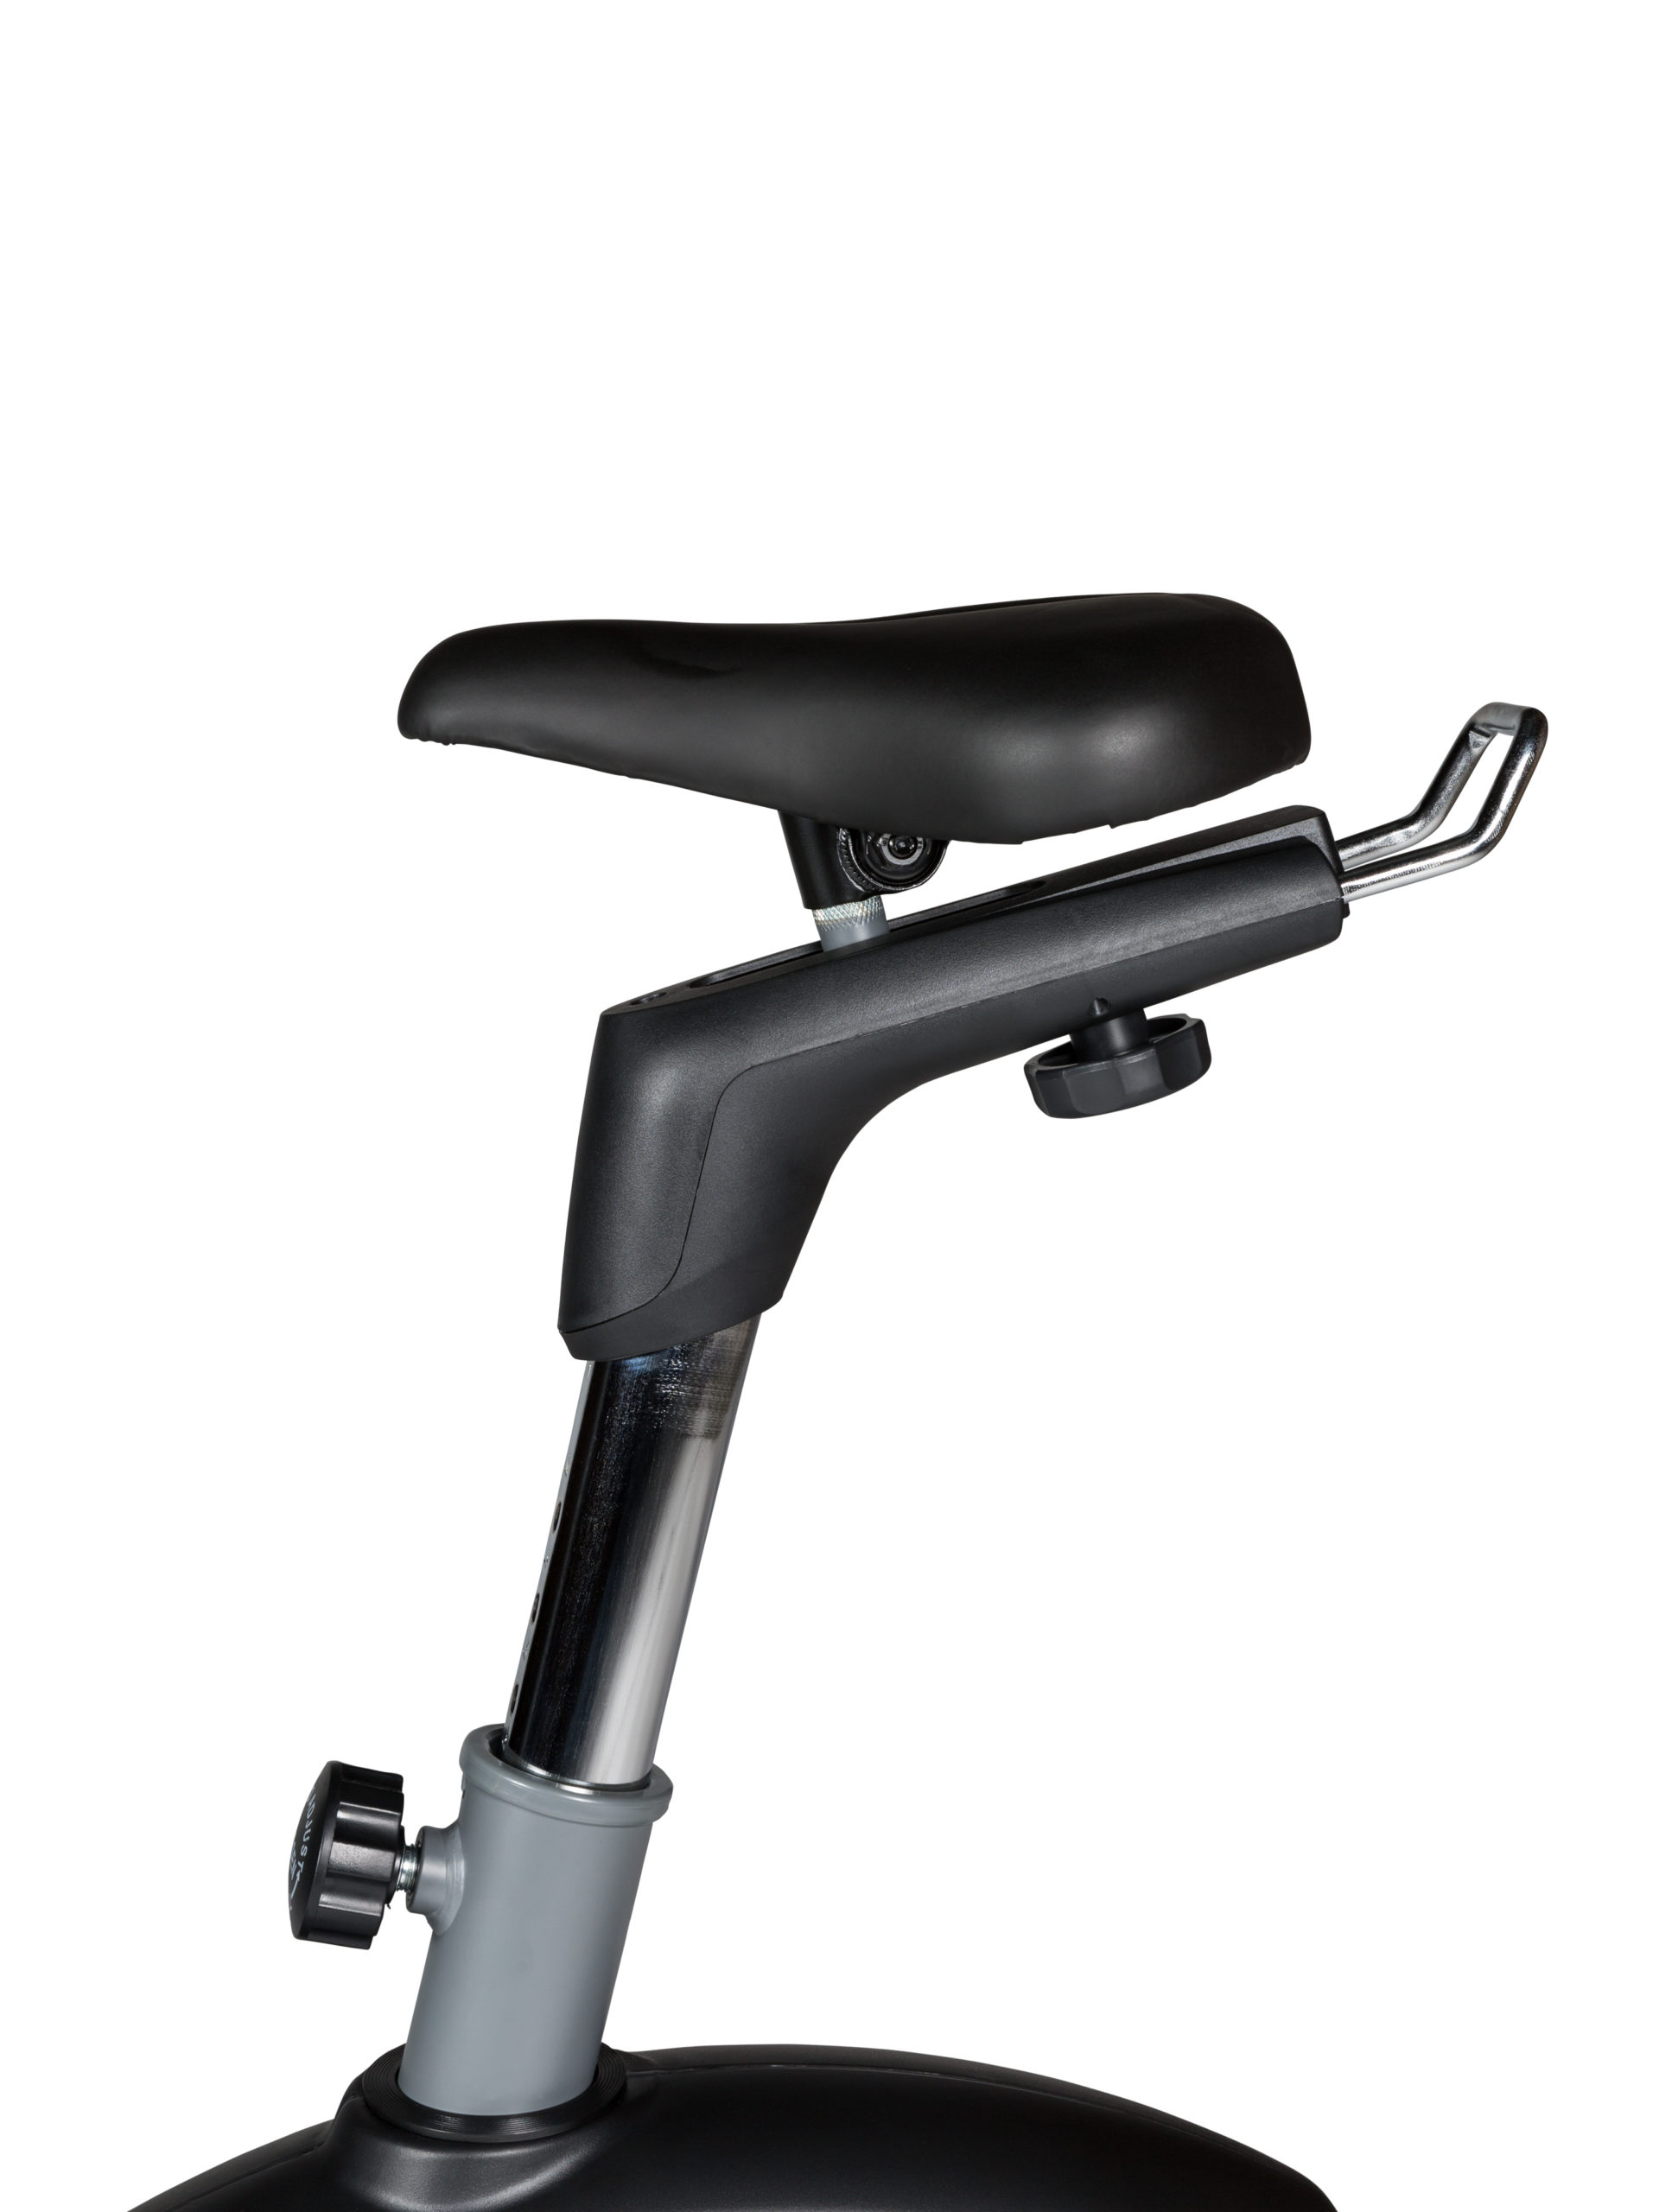 Flow Fitness Tabel Turner DHT750 Hometrainer 7